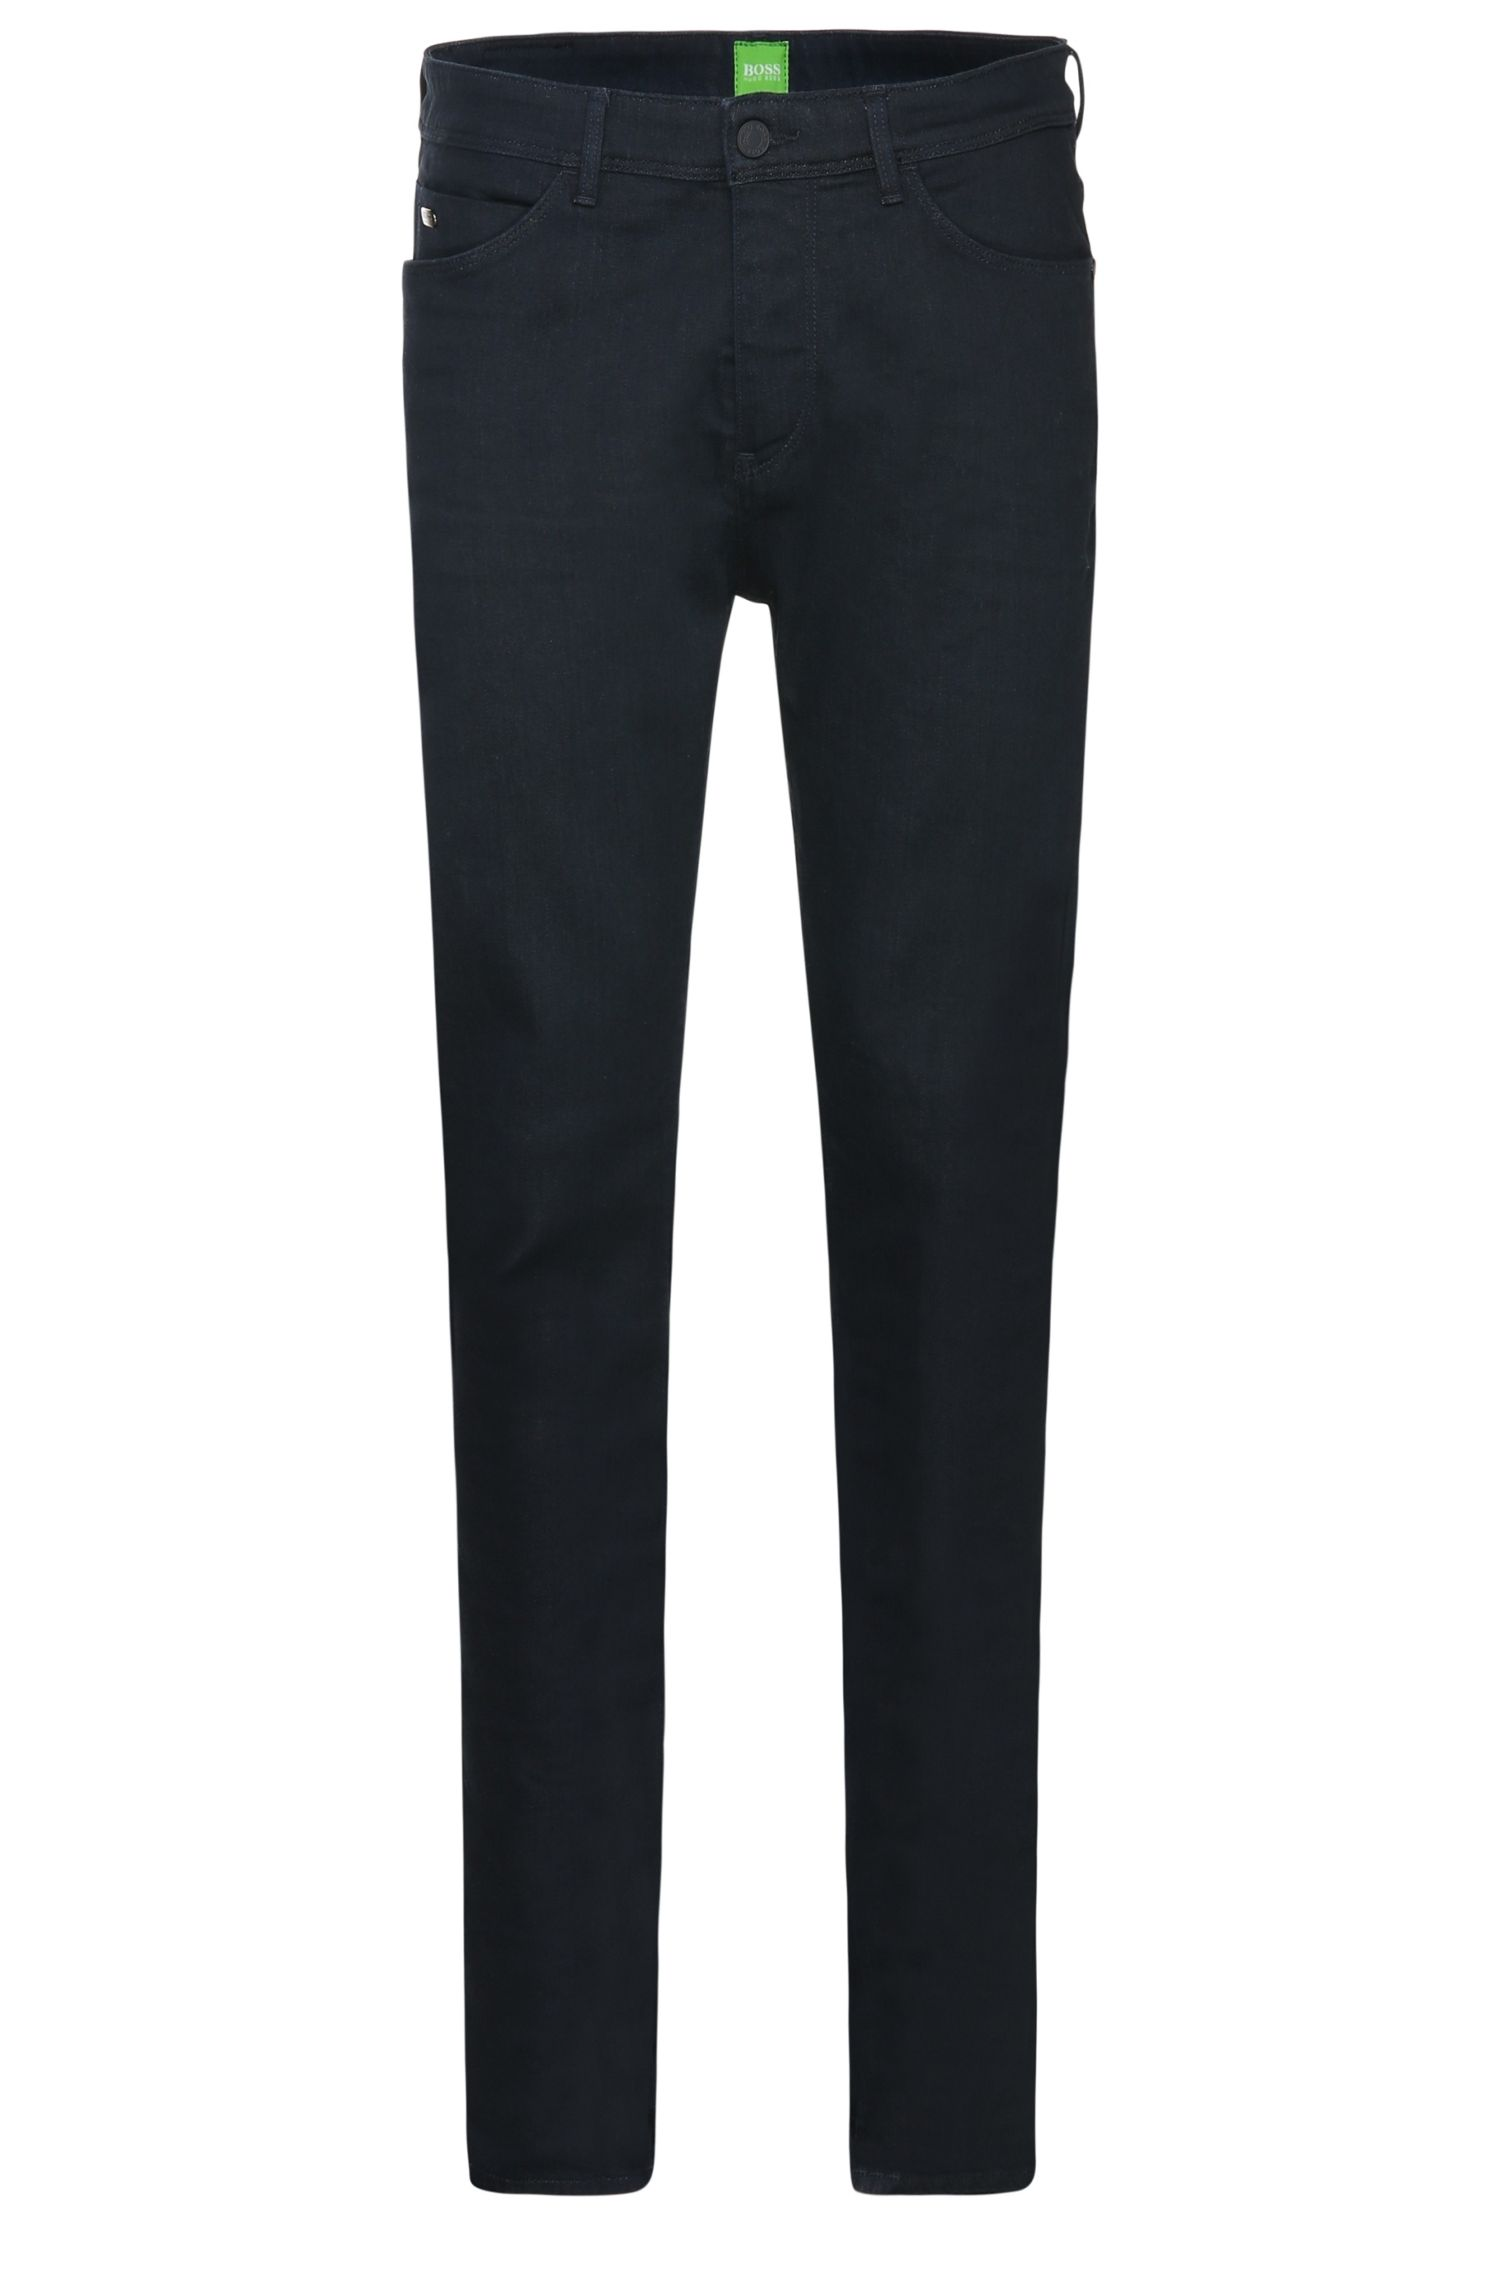 'Derek' | Tapered Fit, 10 oz Stretch Cotton Blend Jeans